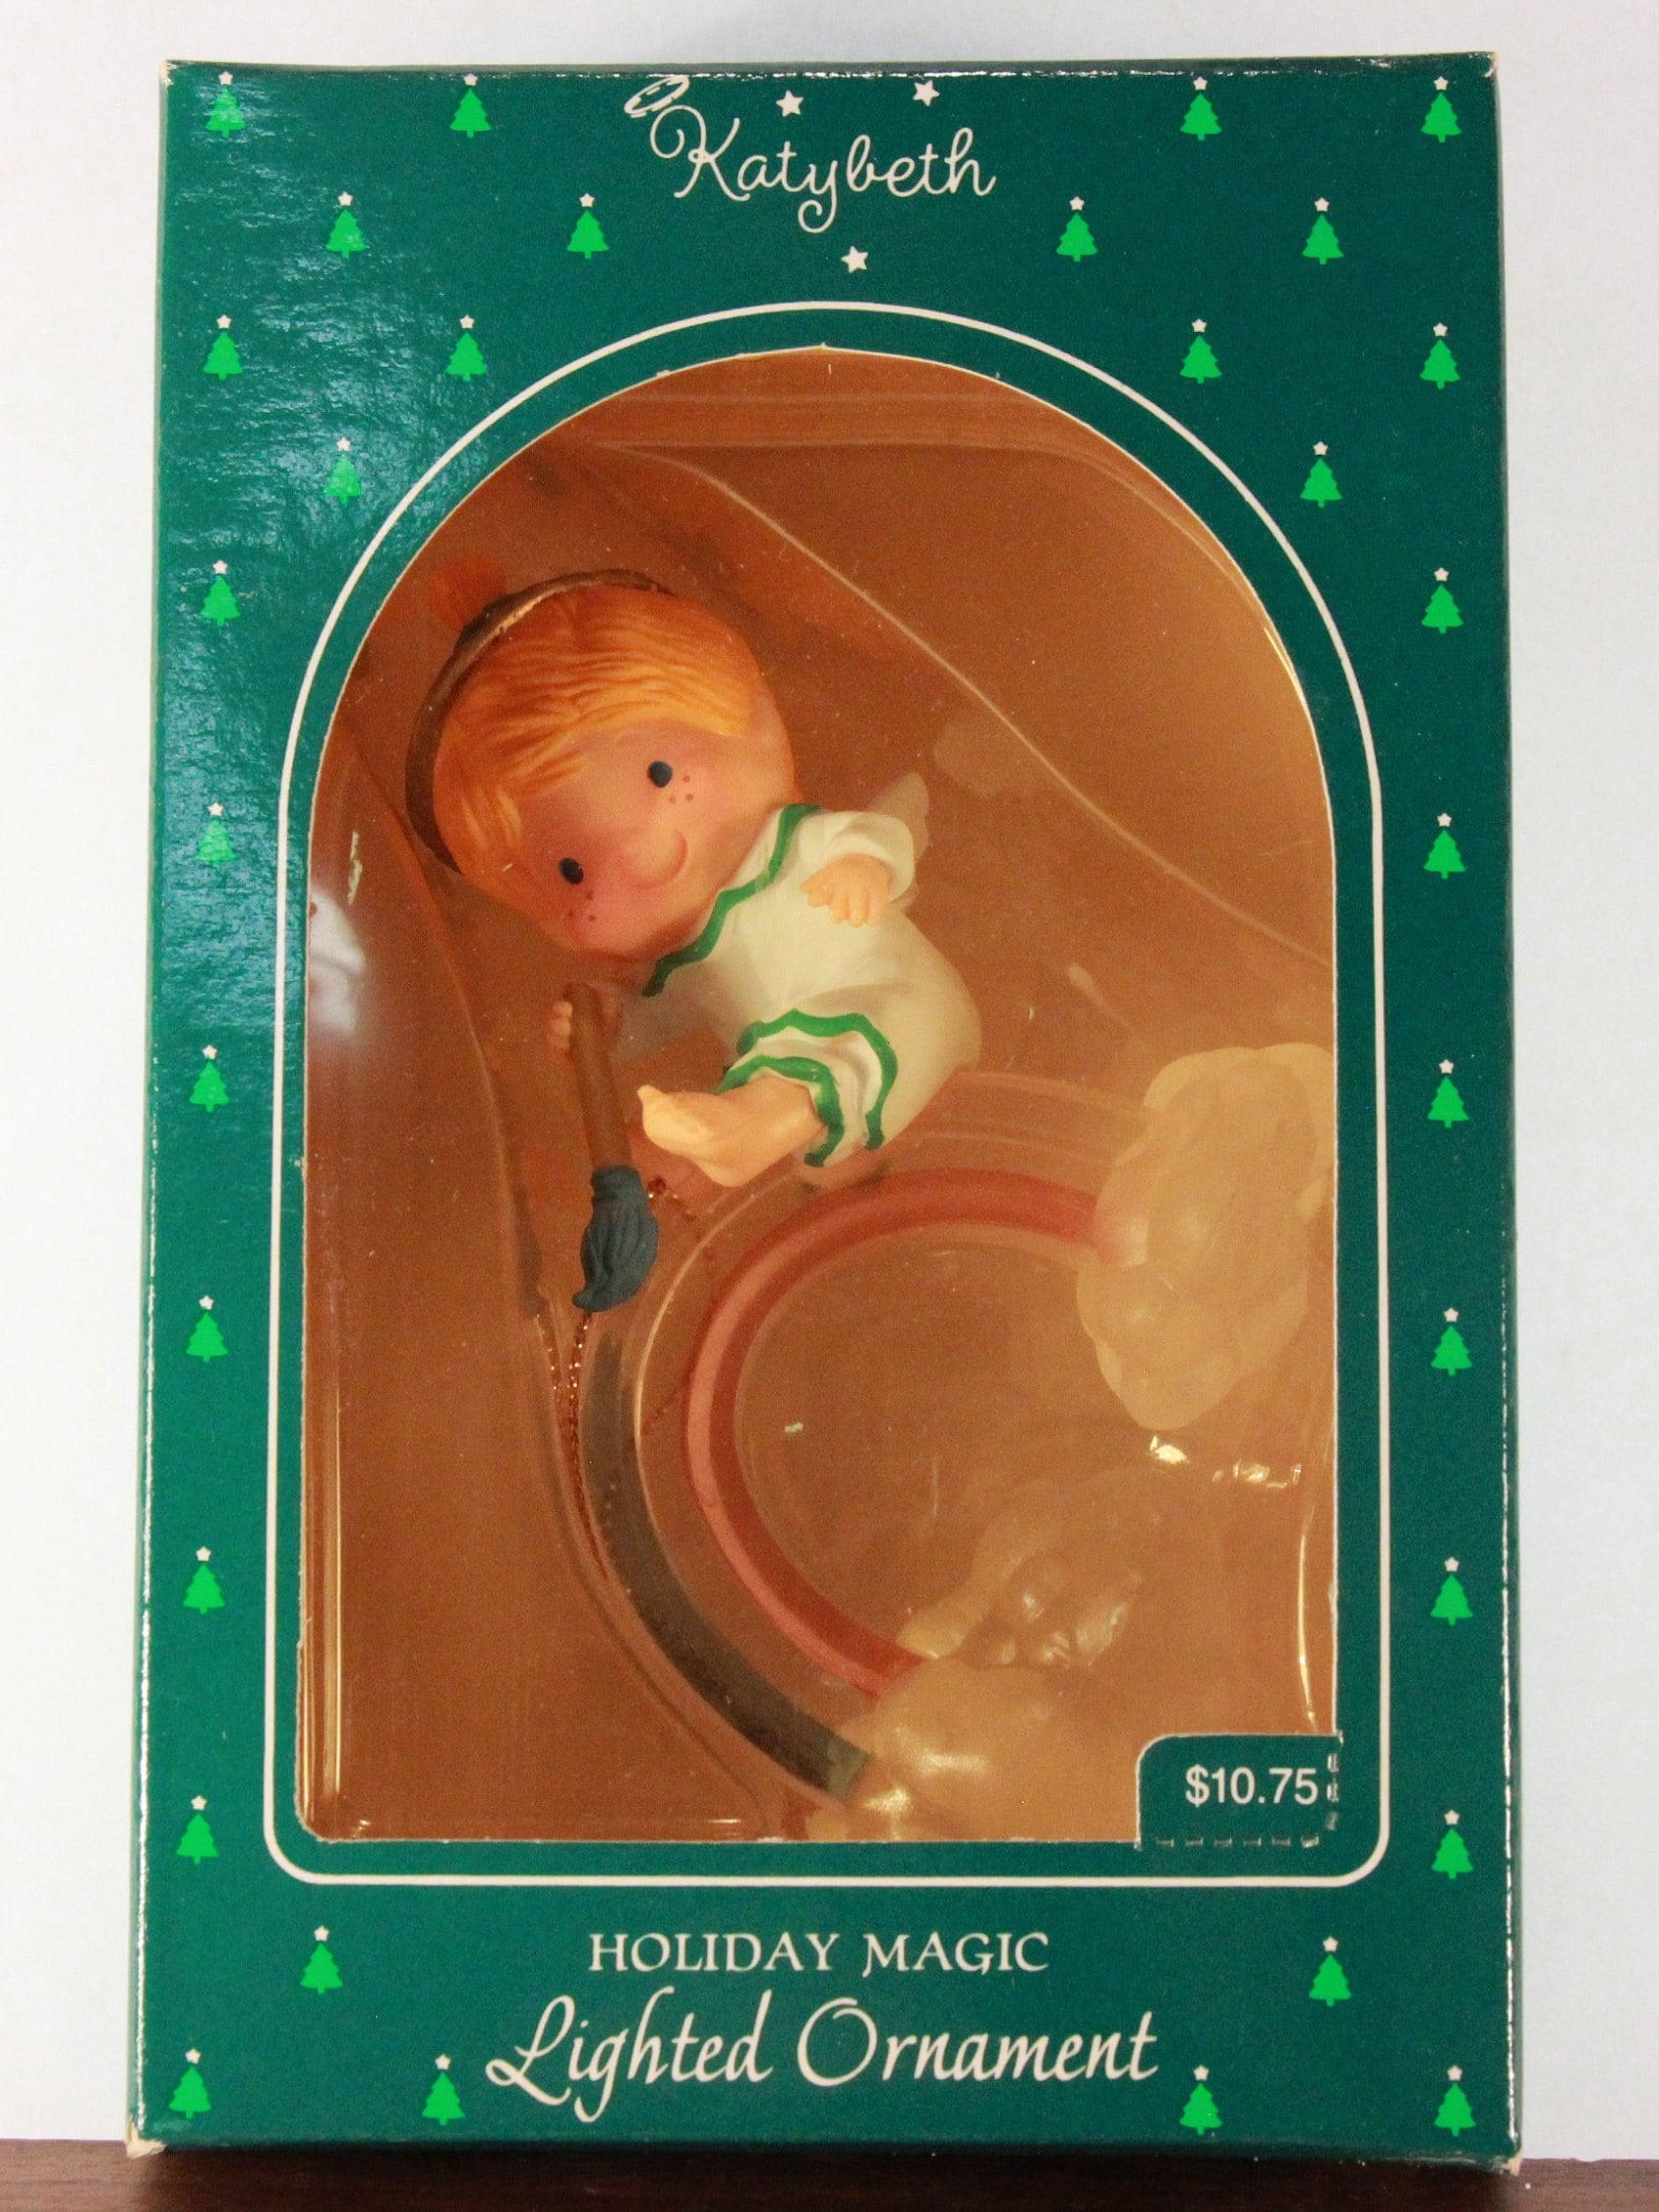 New Vintage 1985 Hallmark Katybeth Holiday Magic Lighted Ornament